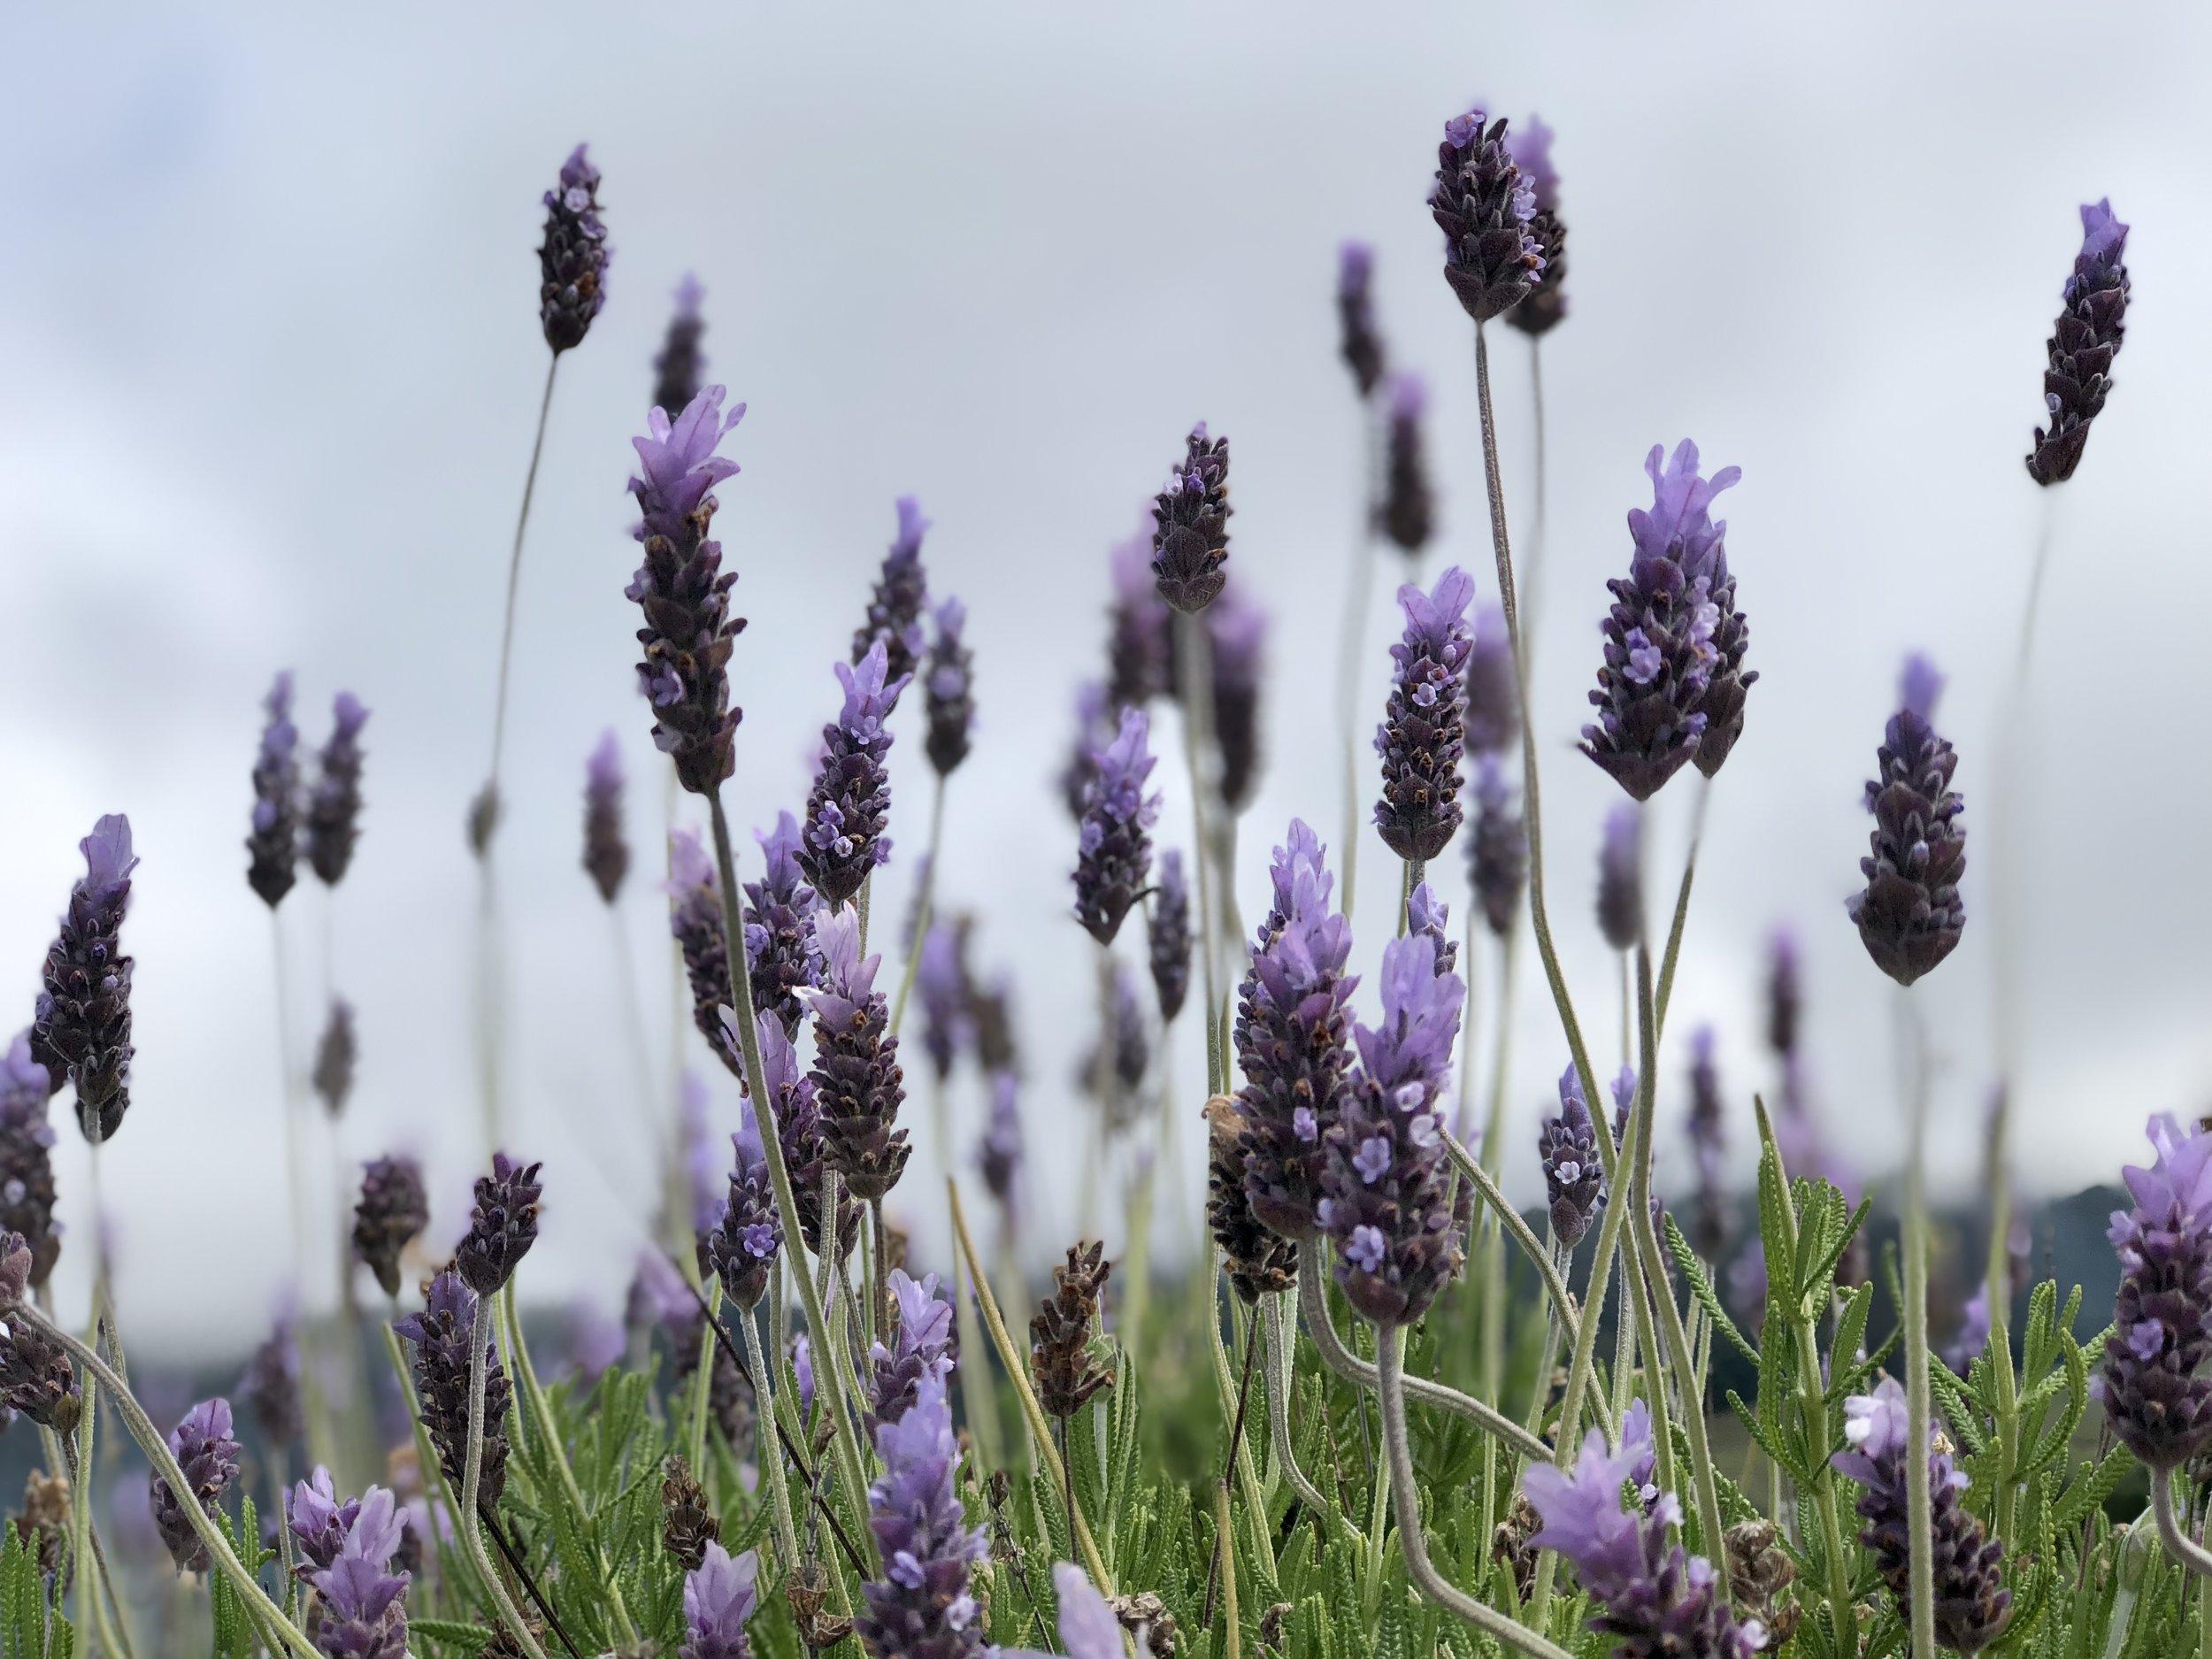 Lavender plants in Kula, HI. Photo by:  @thelotusproject_yeg